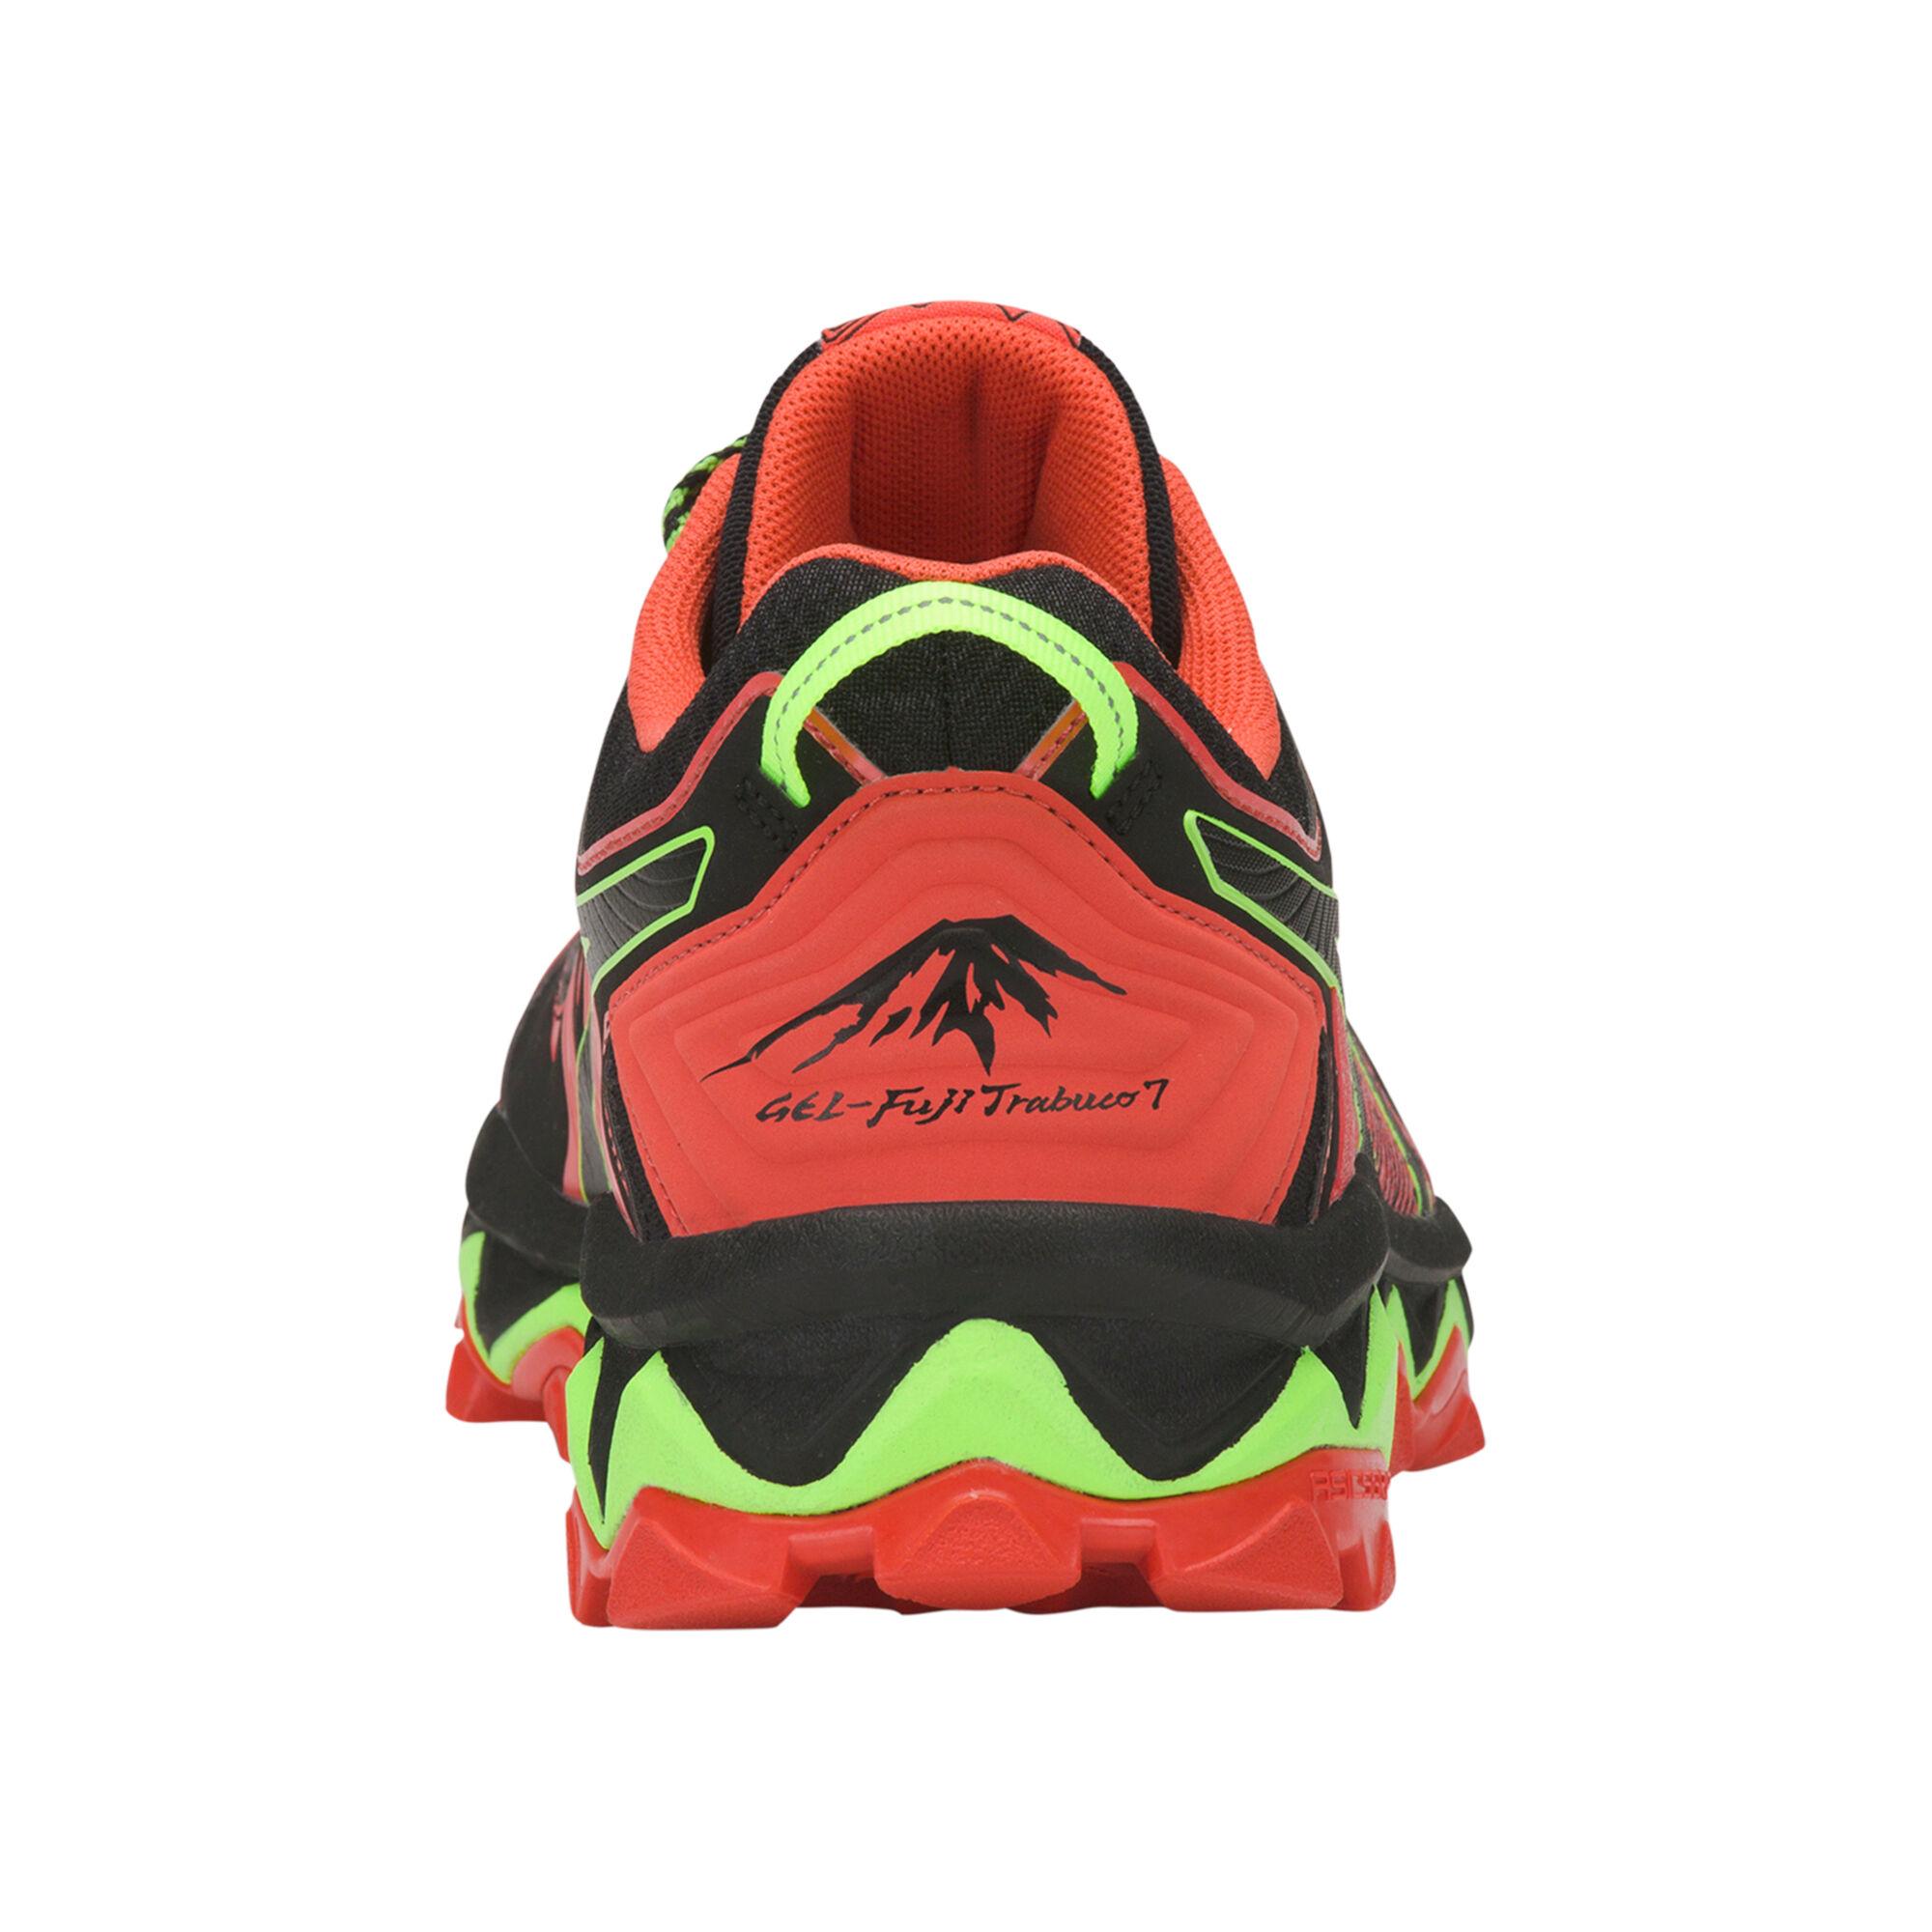 a6aad2e28bc buy Asics Gel-Fuji Trabuco 7 Trail Running Shoe Men - Orange, Black ...